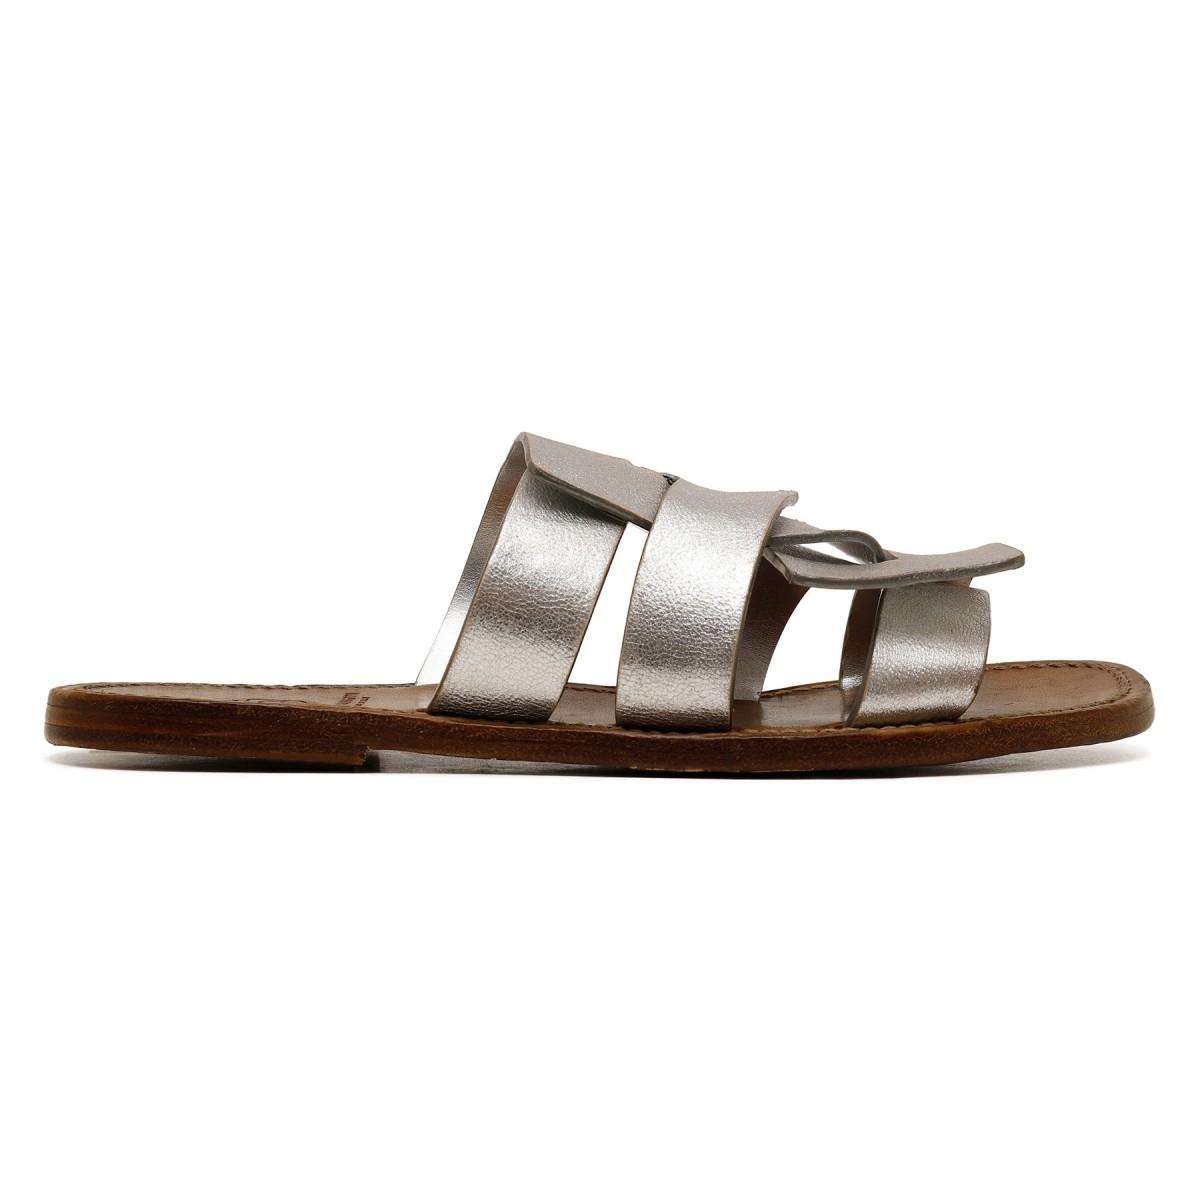 Metallic silver leather slide sandals